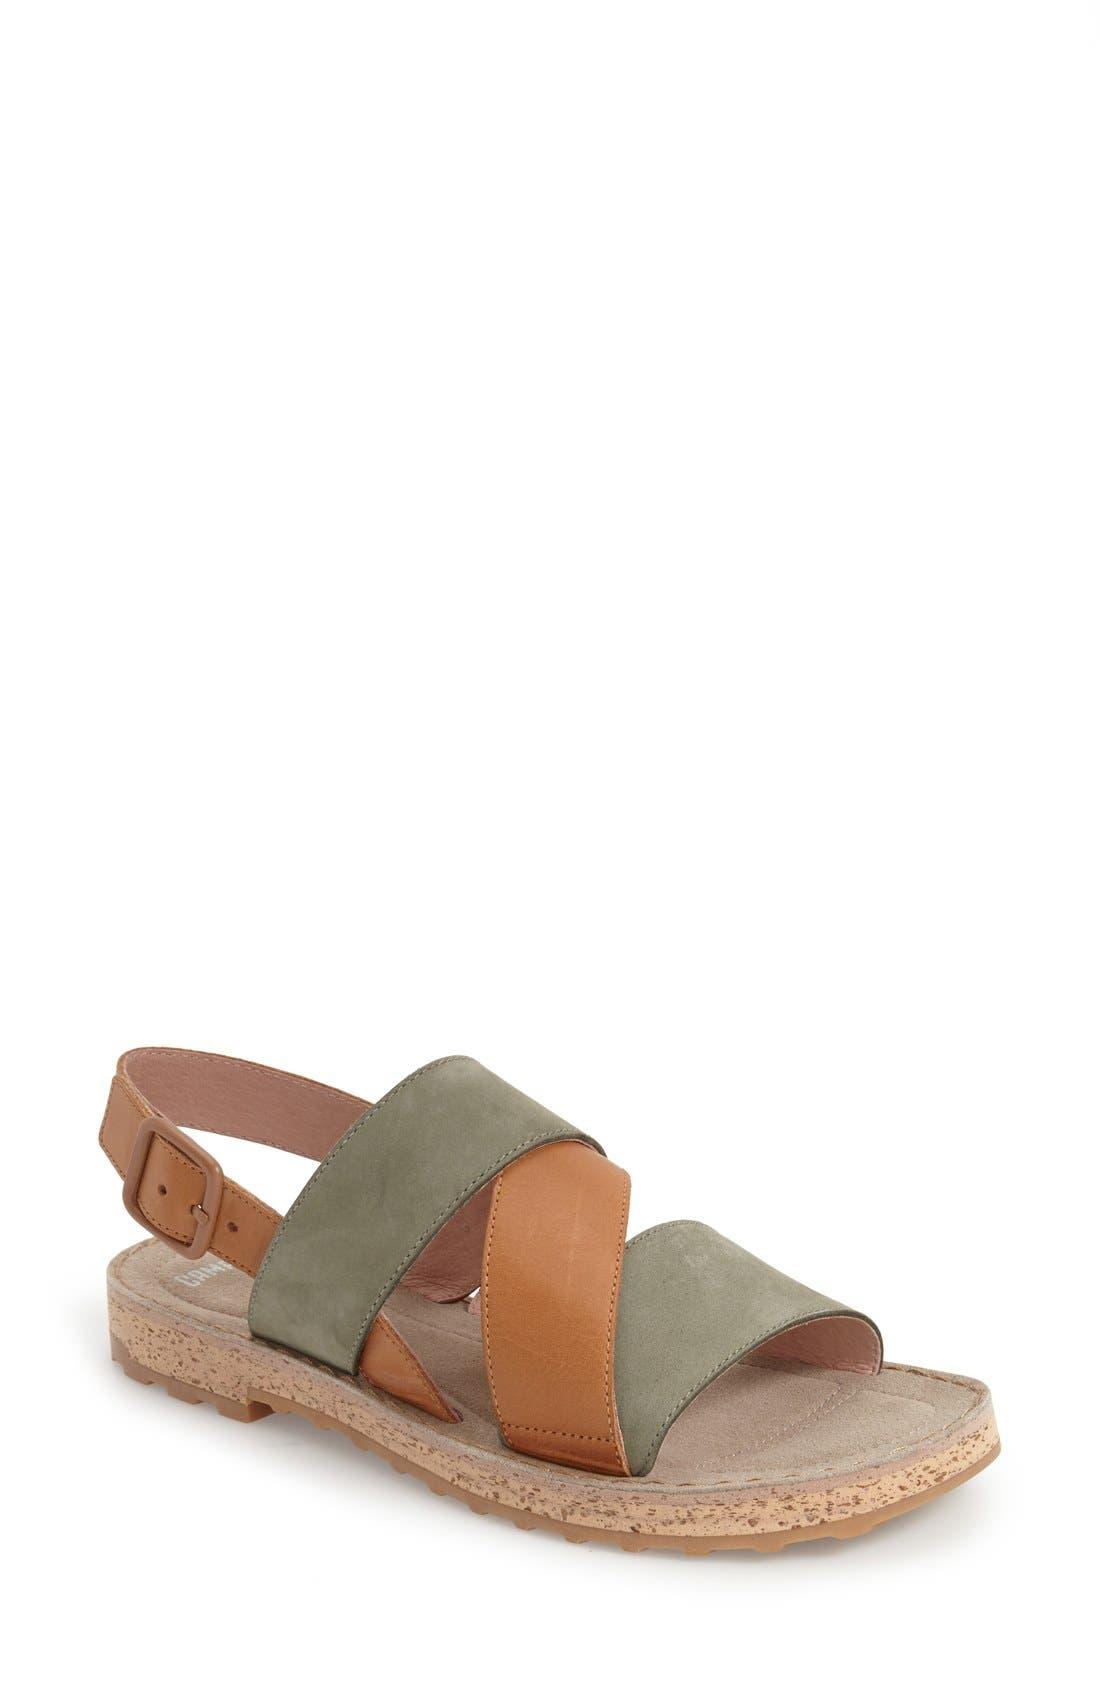 Alternate Image 1 Selected - Camper 'Pimpom' Leather & Suede Crisscross Strap Sandal (Women)